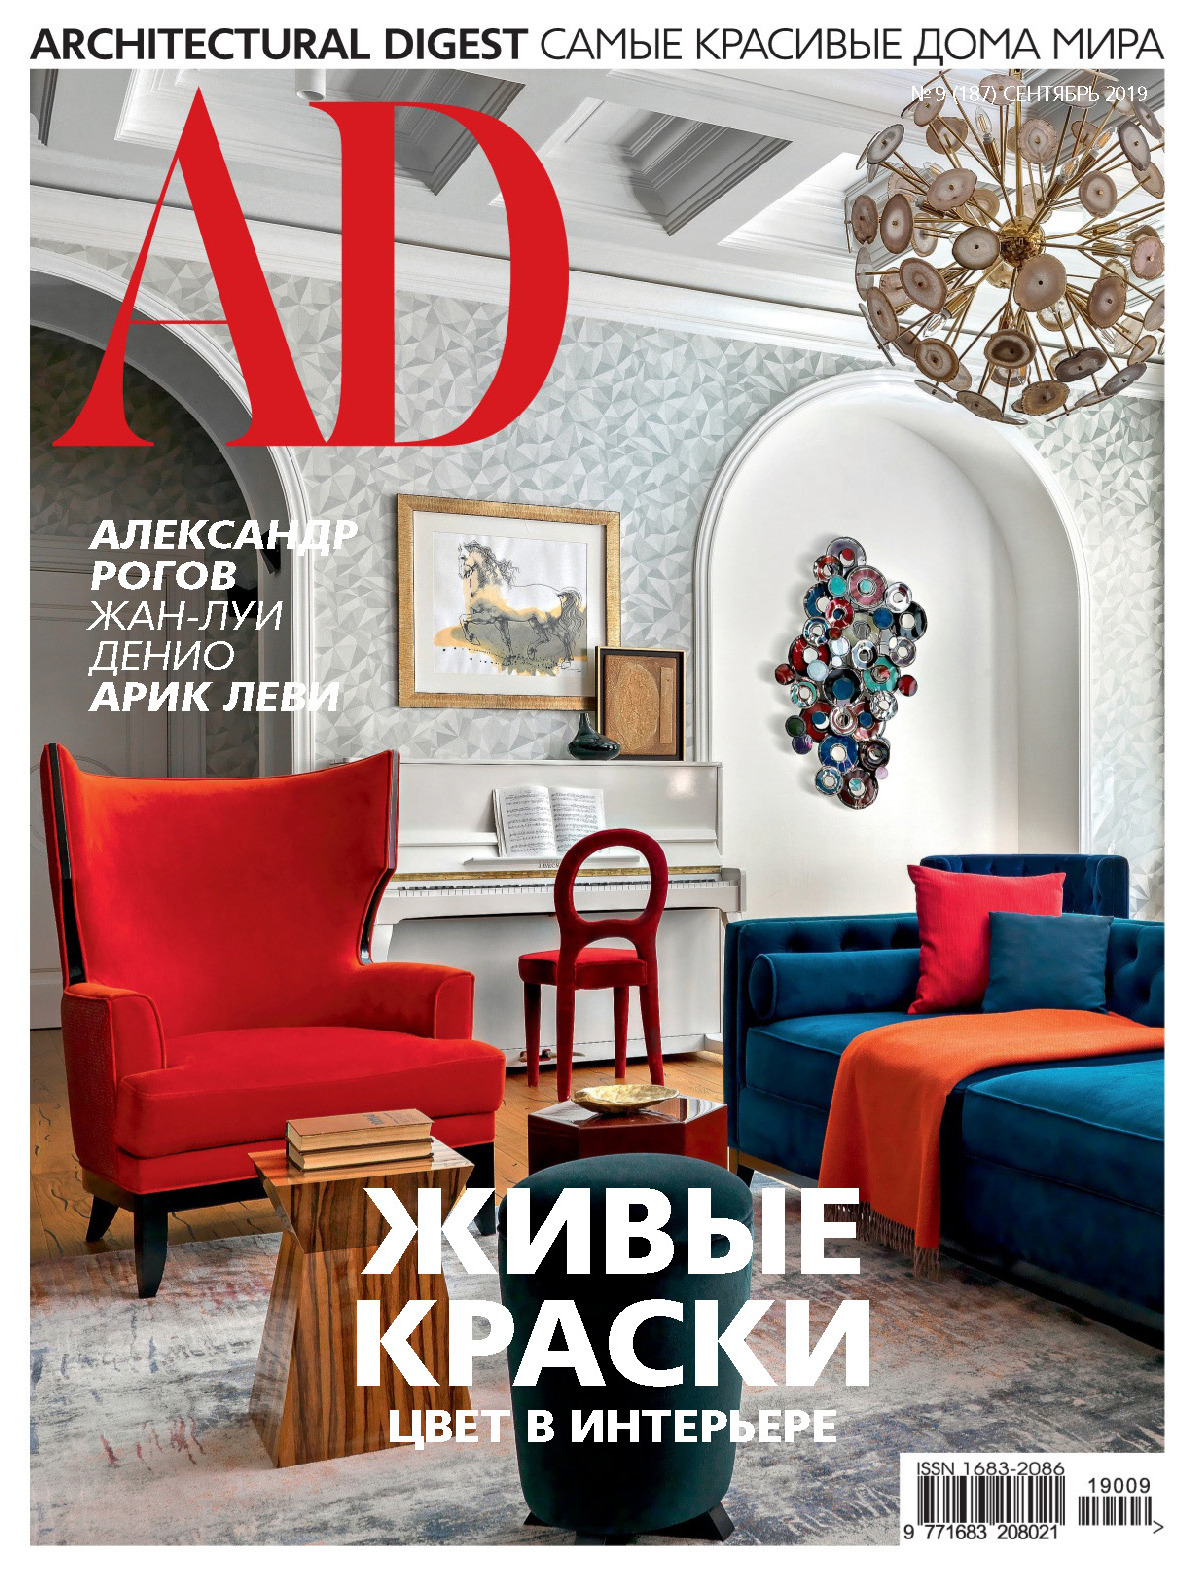 《AD》俄罗斯版室内室外设计杂志2019年09月号